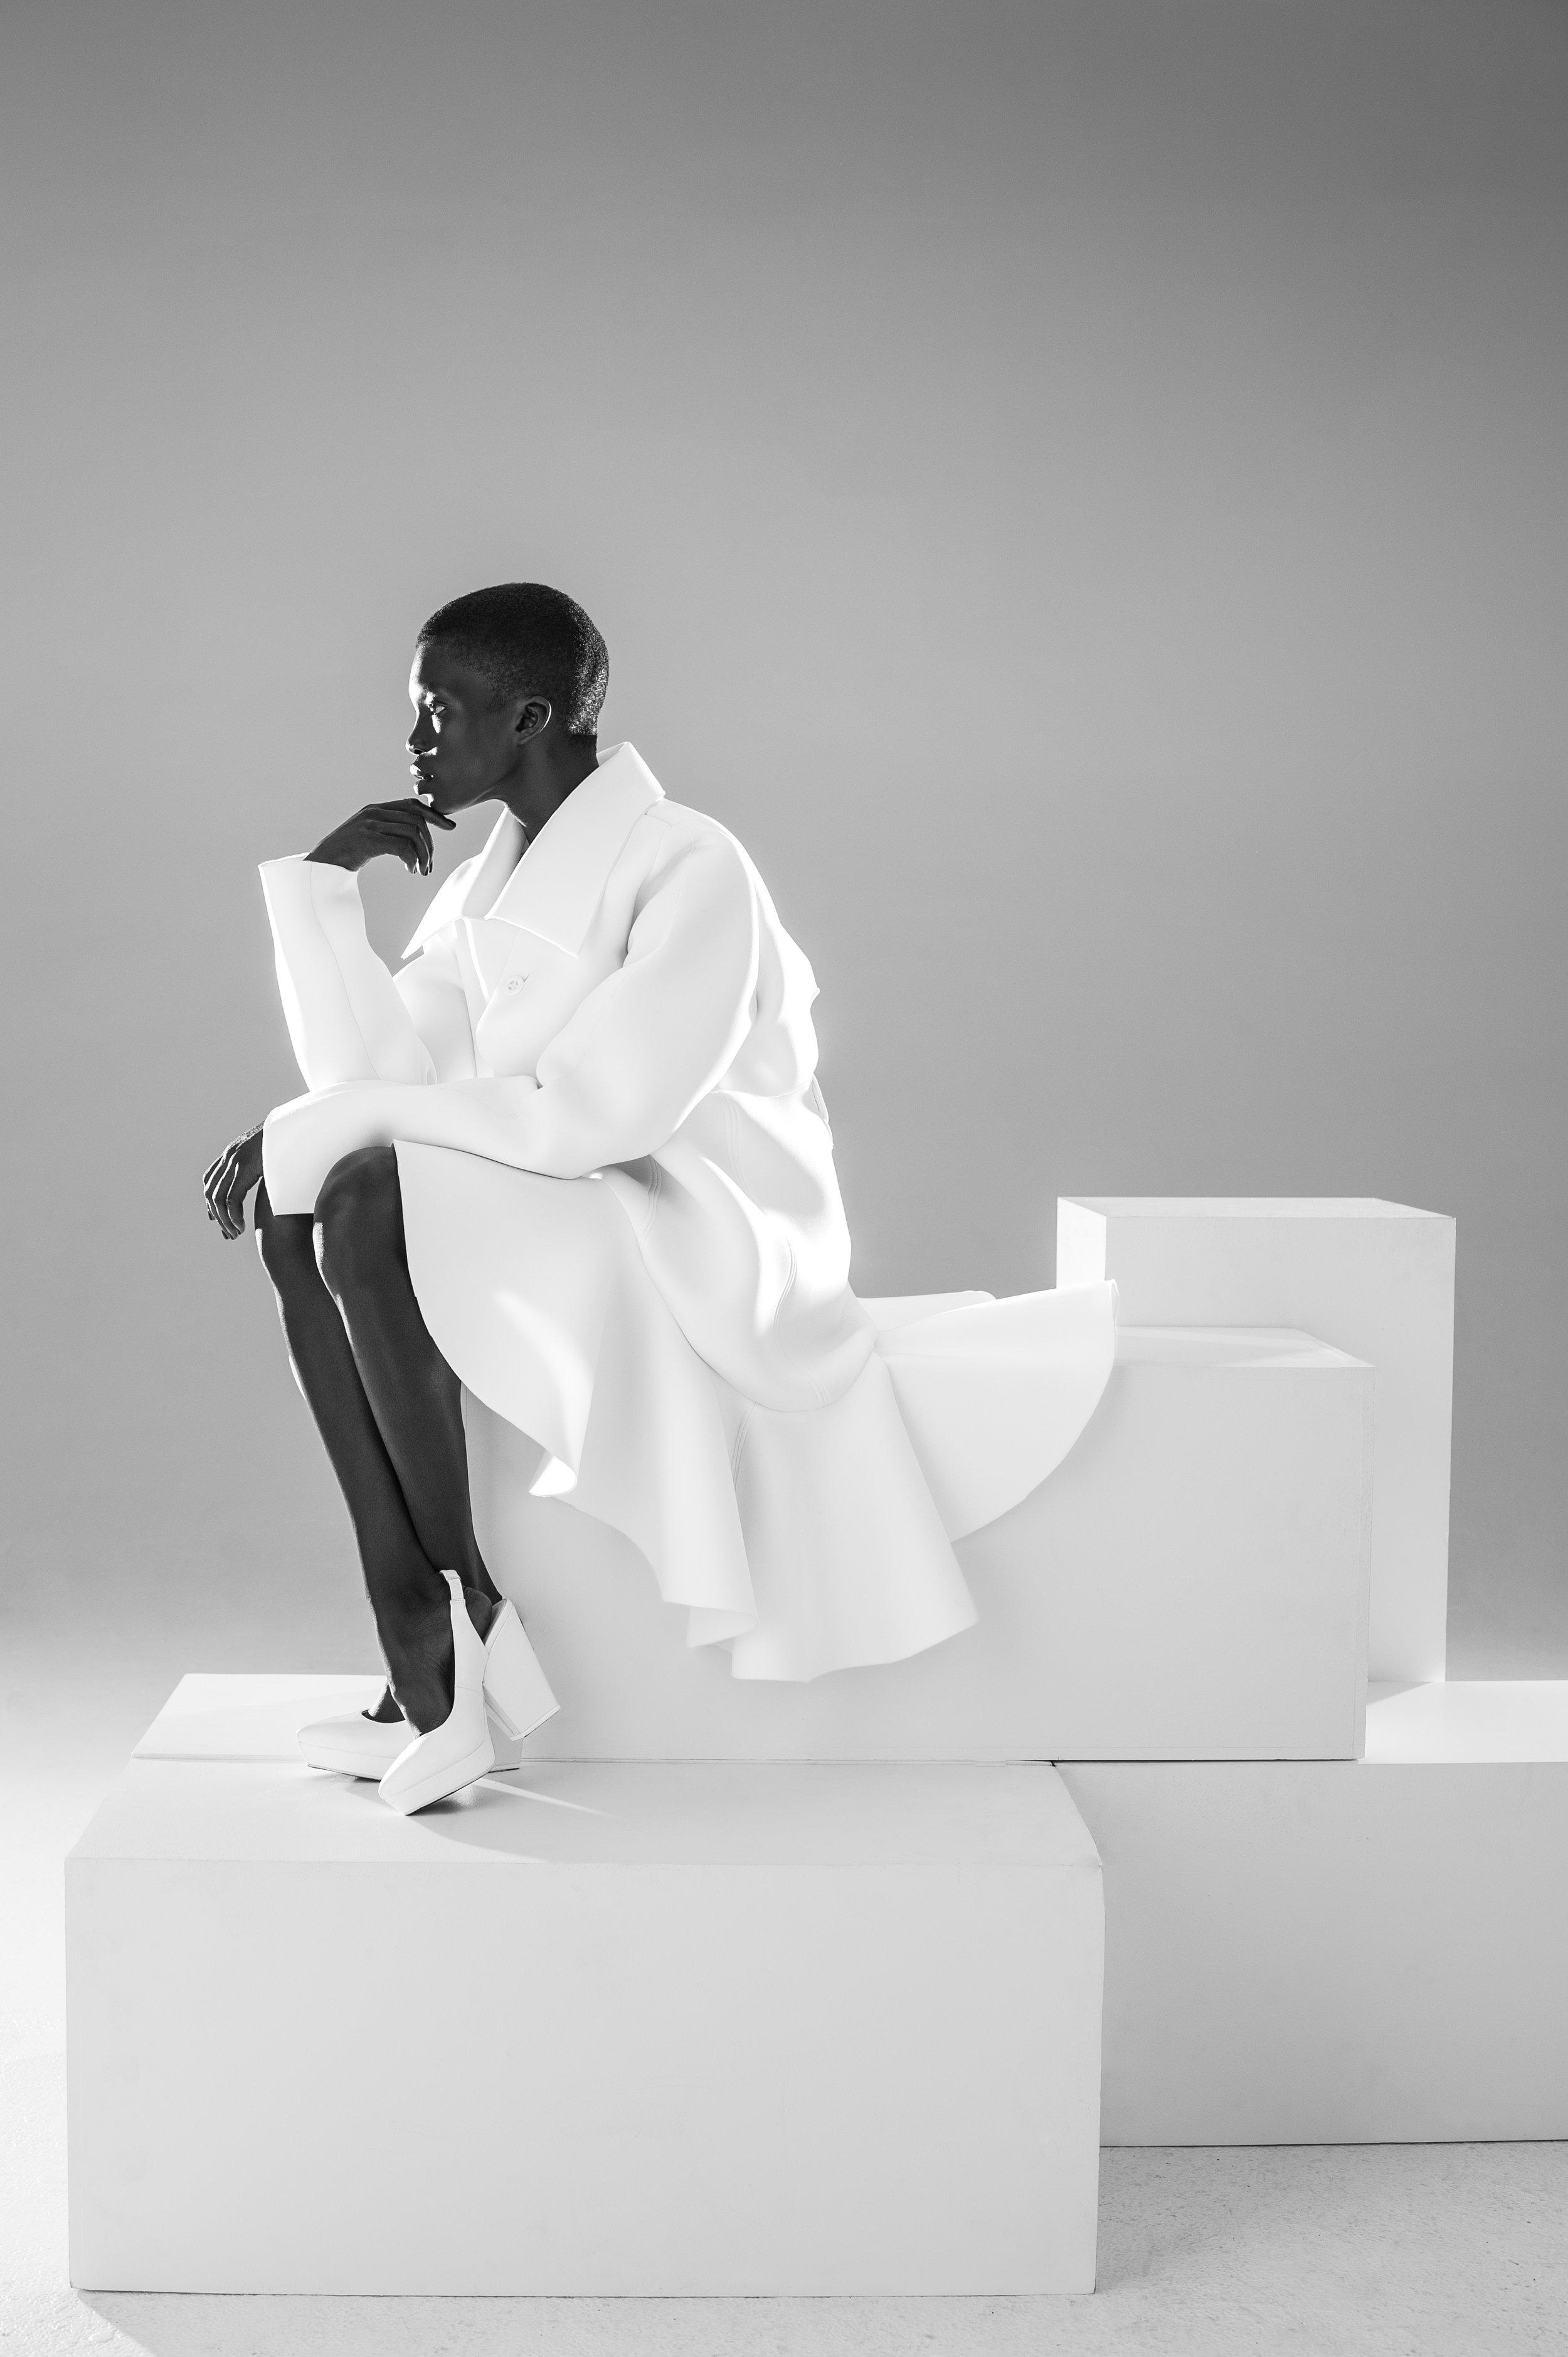 Coat by Nika Tang, MFA Fashion Design.